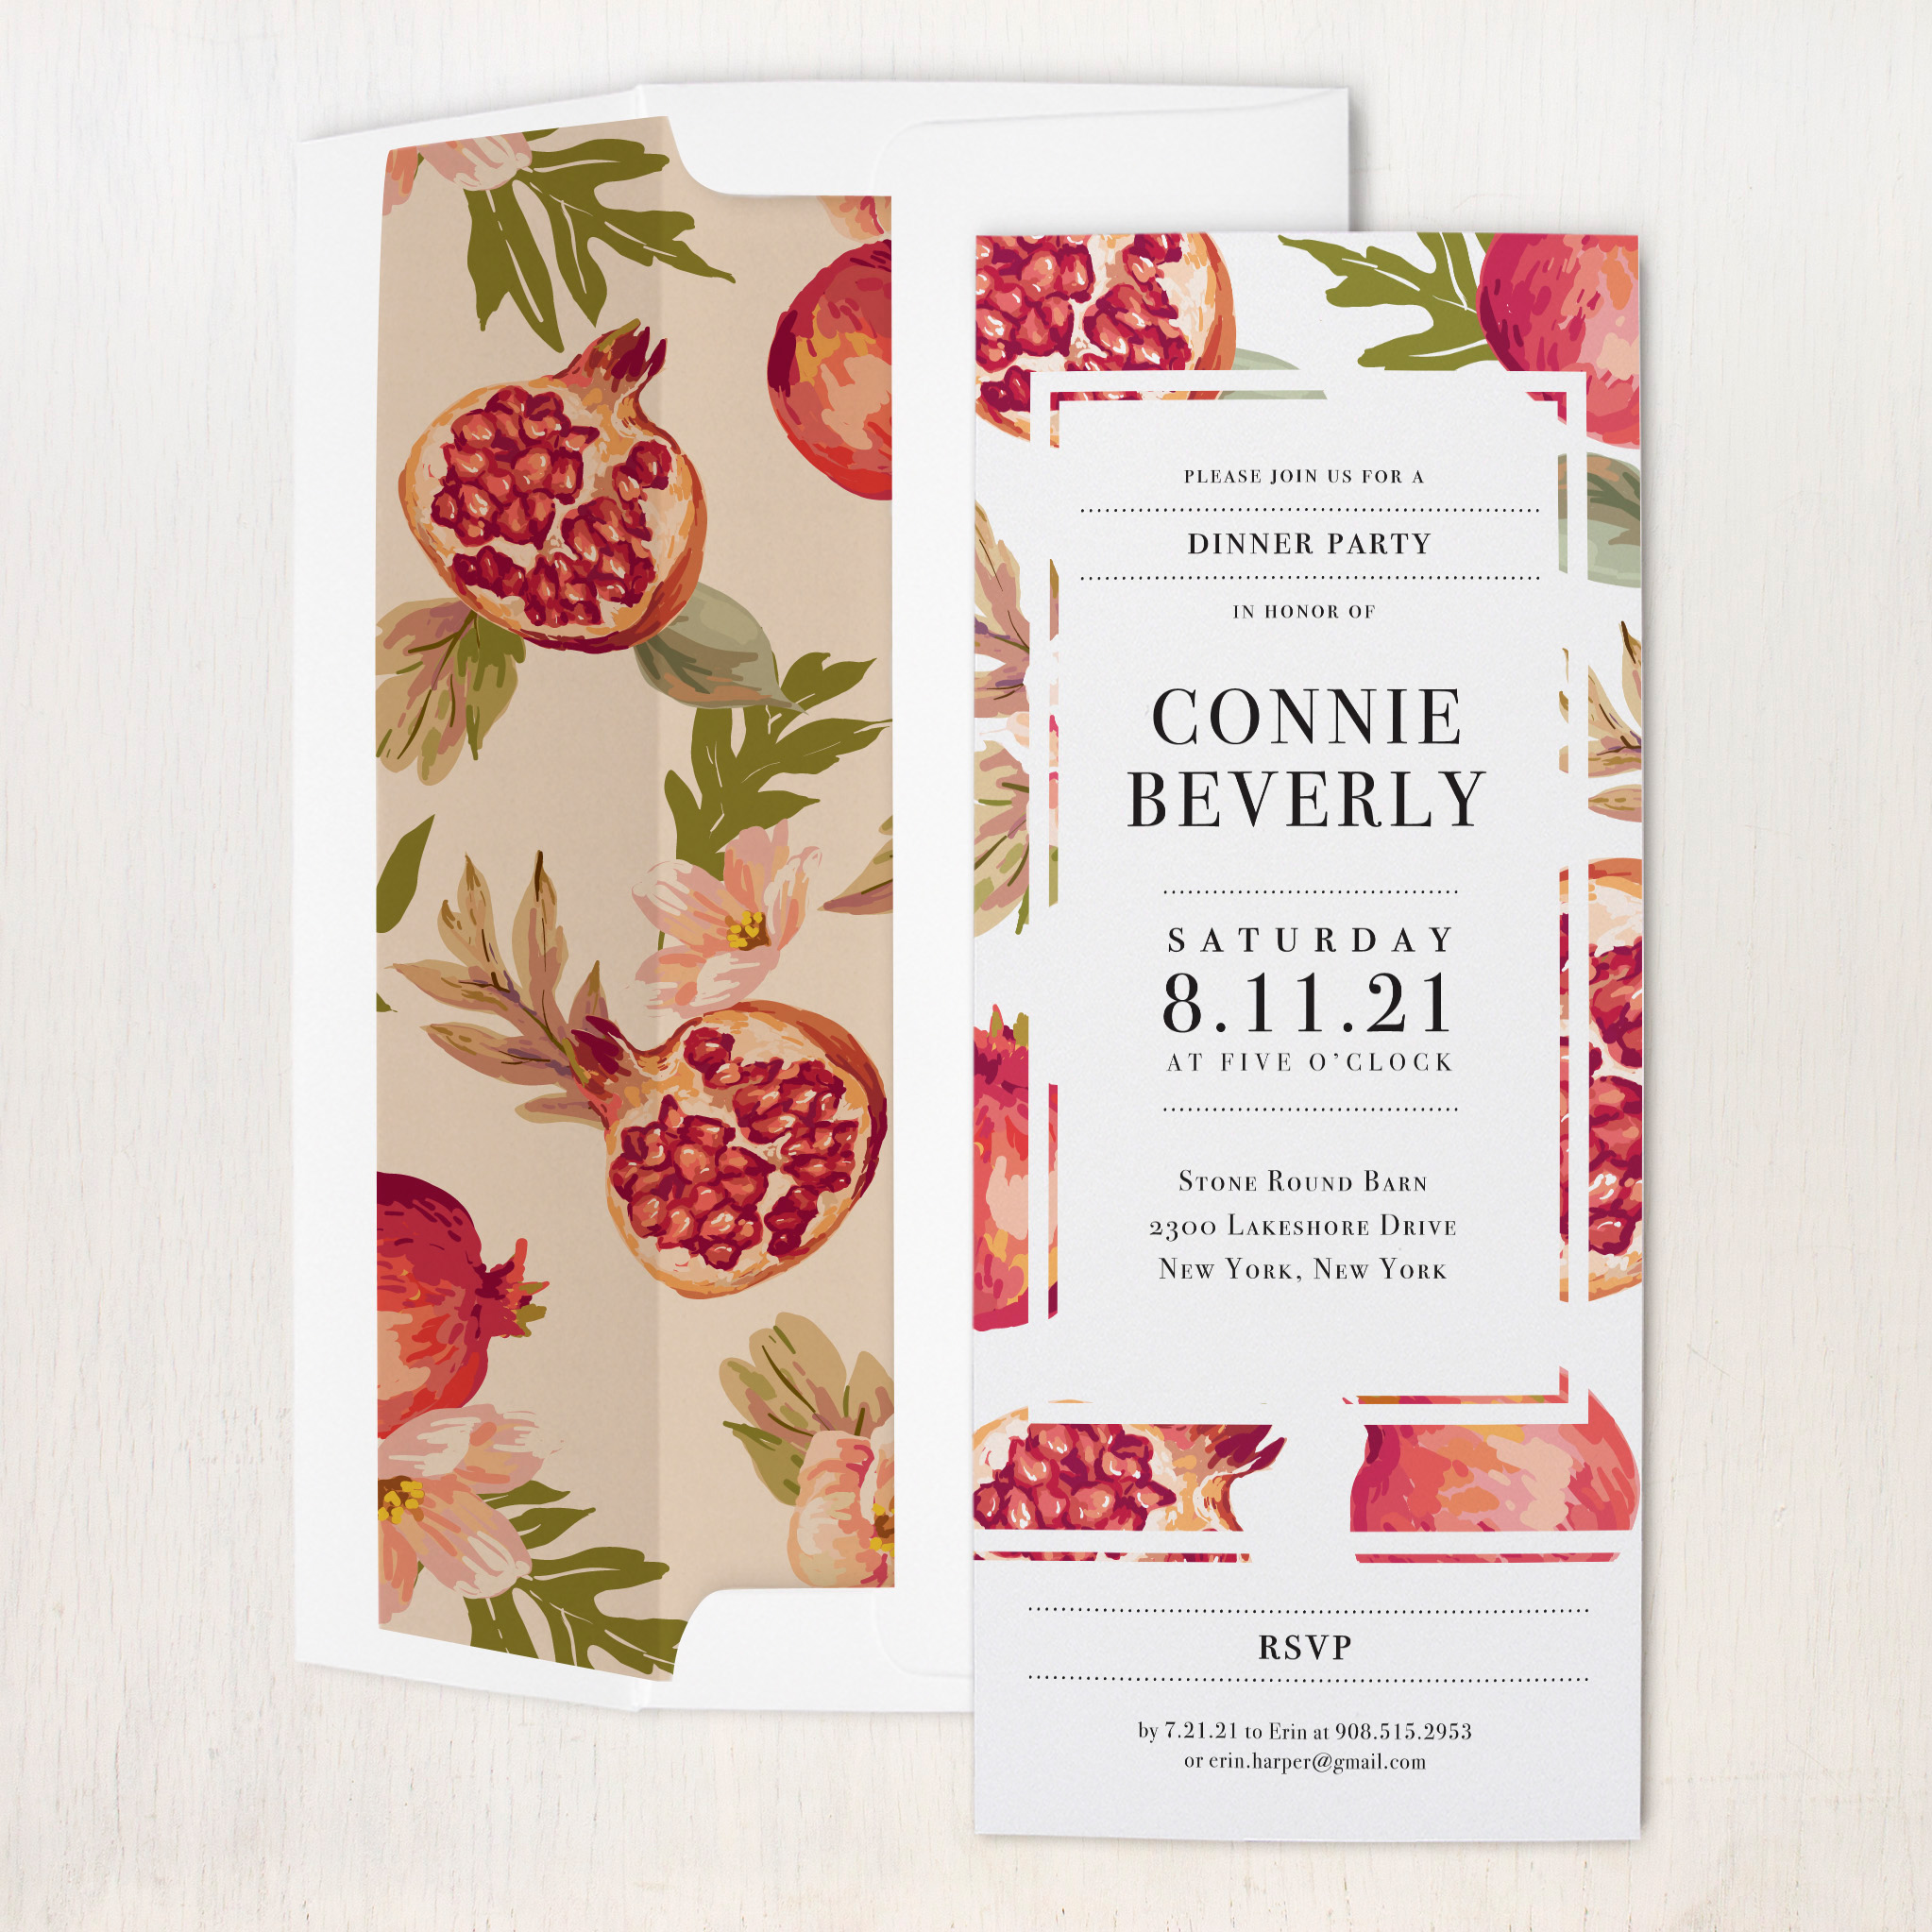 Pomegranate Pop Dinner Party Invitations | Beacon Lane